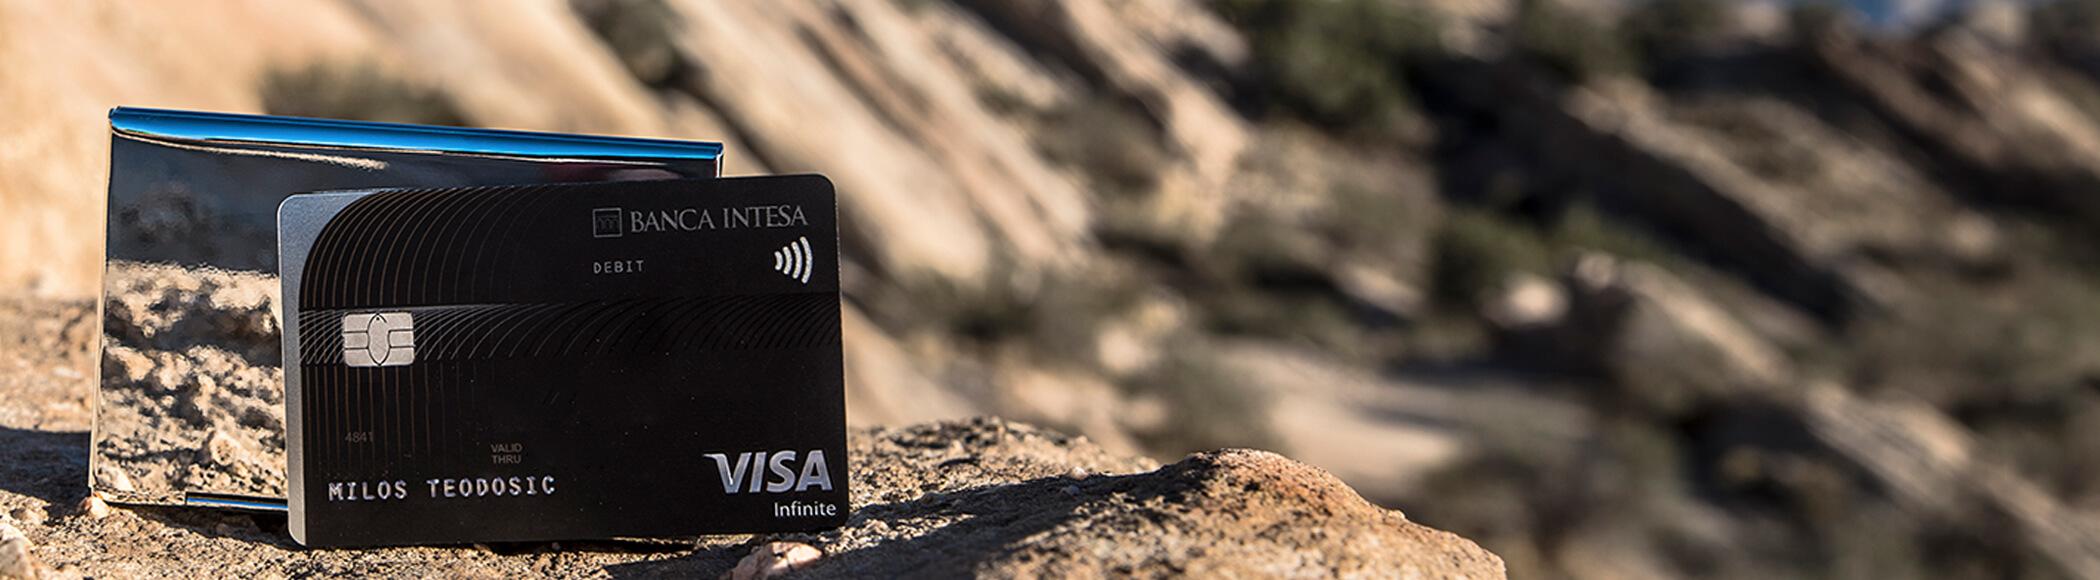 visa infinite debitna kartica premium card svet luksuza i pogodnosti i popusta